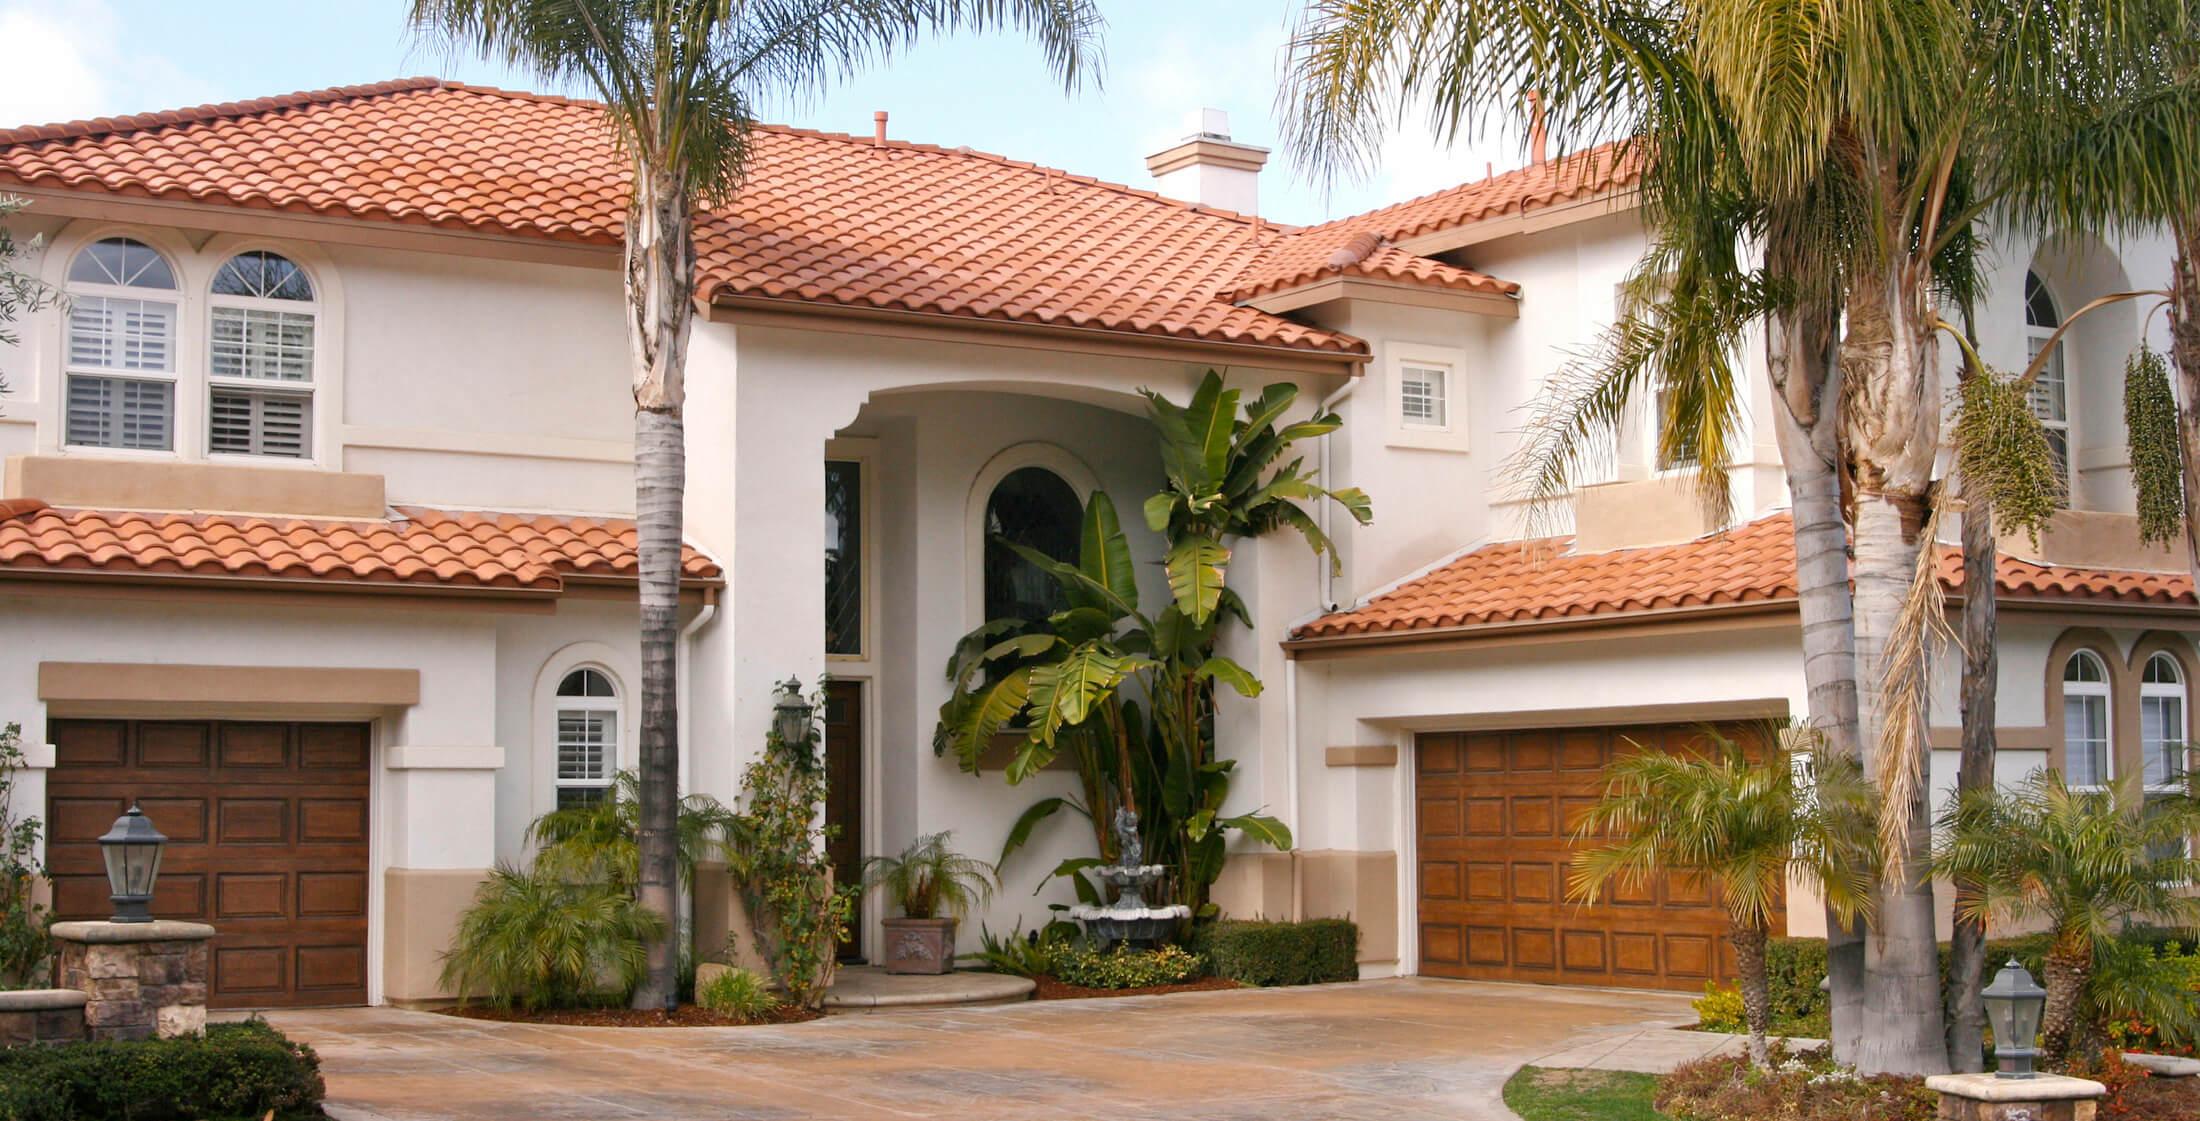 Chula Vista San Diego CA Real Estate MLS Homes Condos